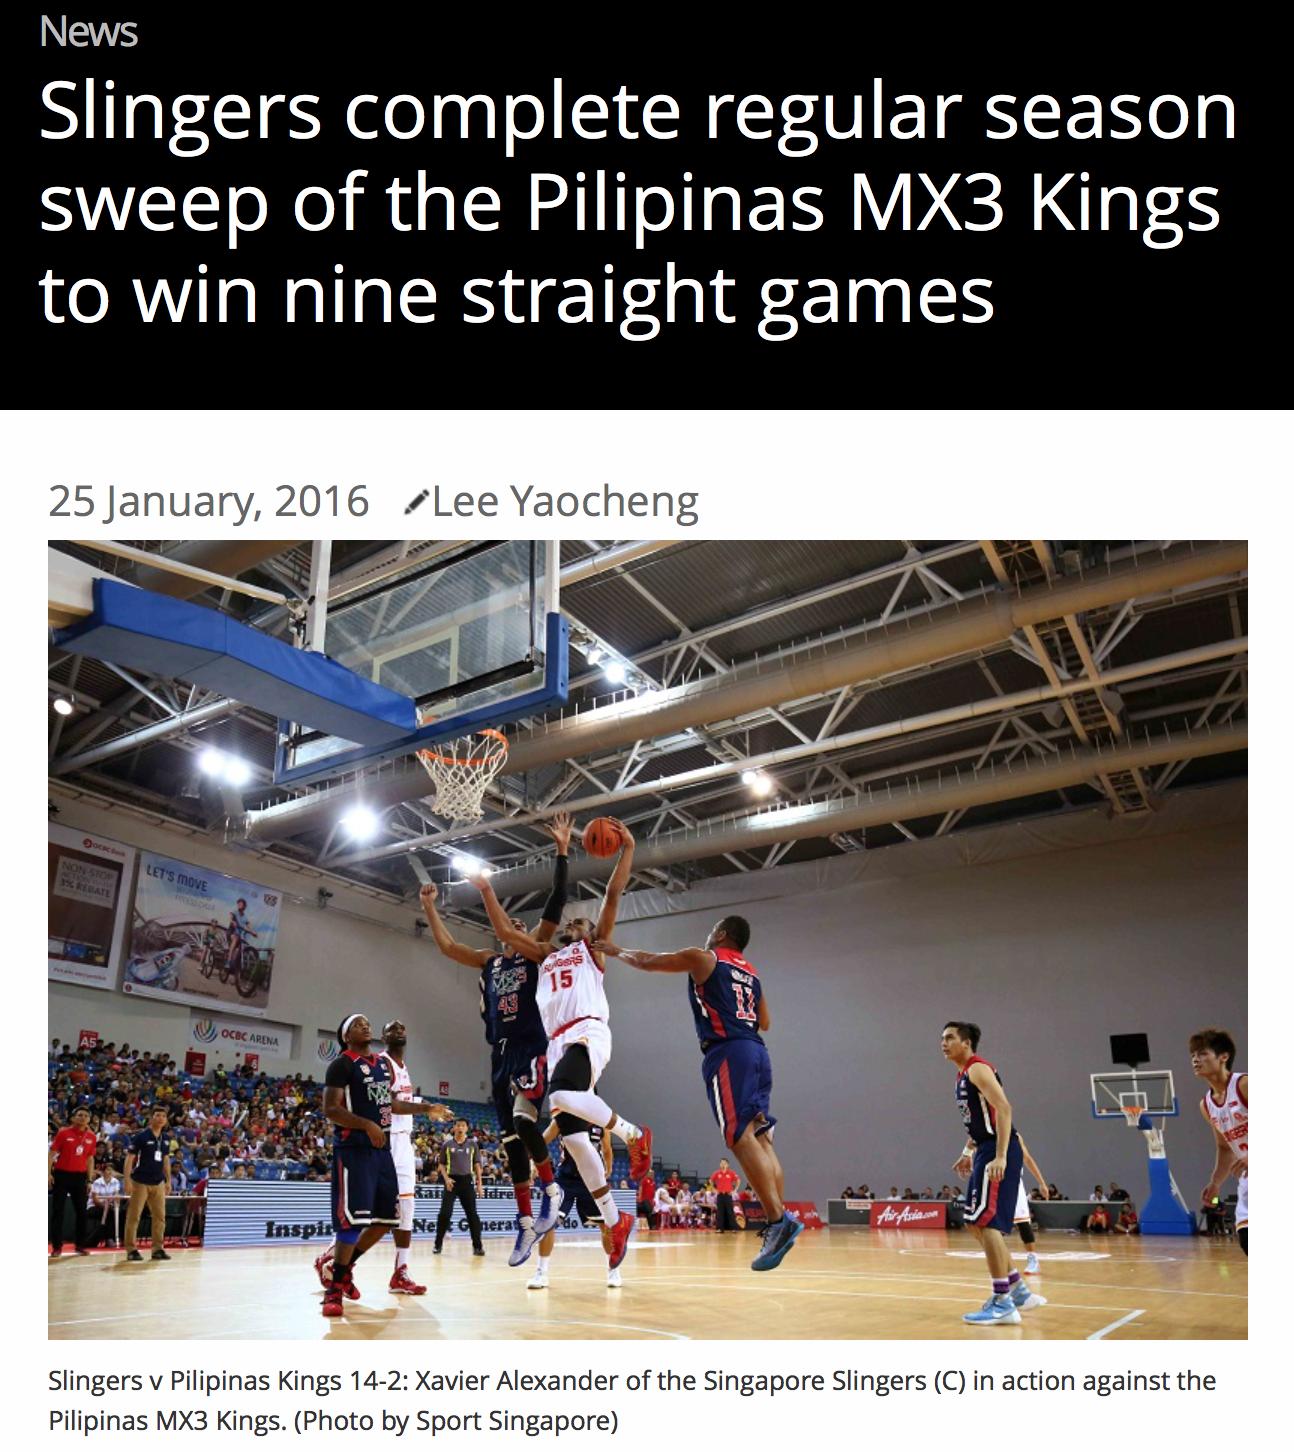 ABL 2015/16 for Thomson Reuters/Action Images for Sport Singapore (www.myactivesg.com)